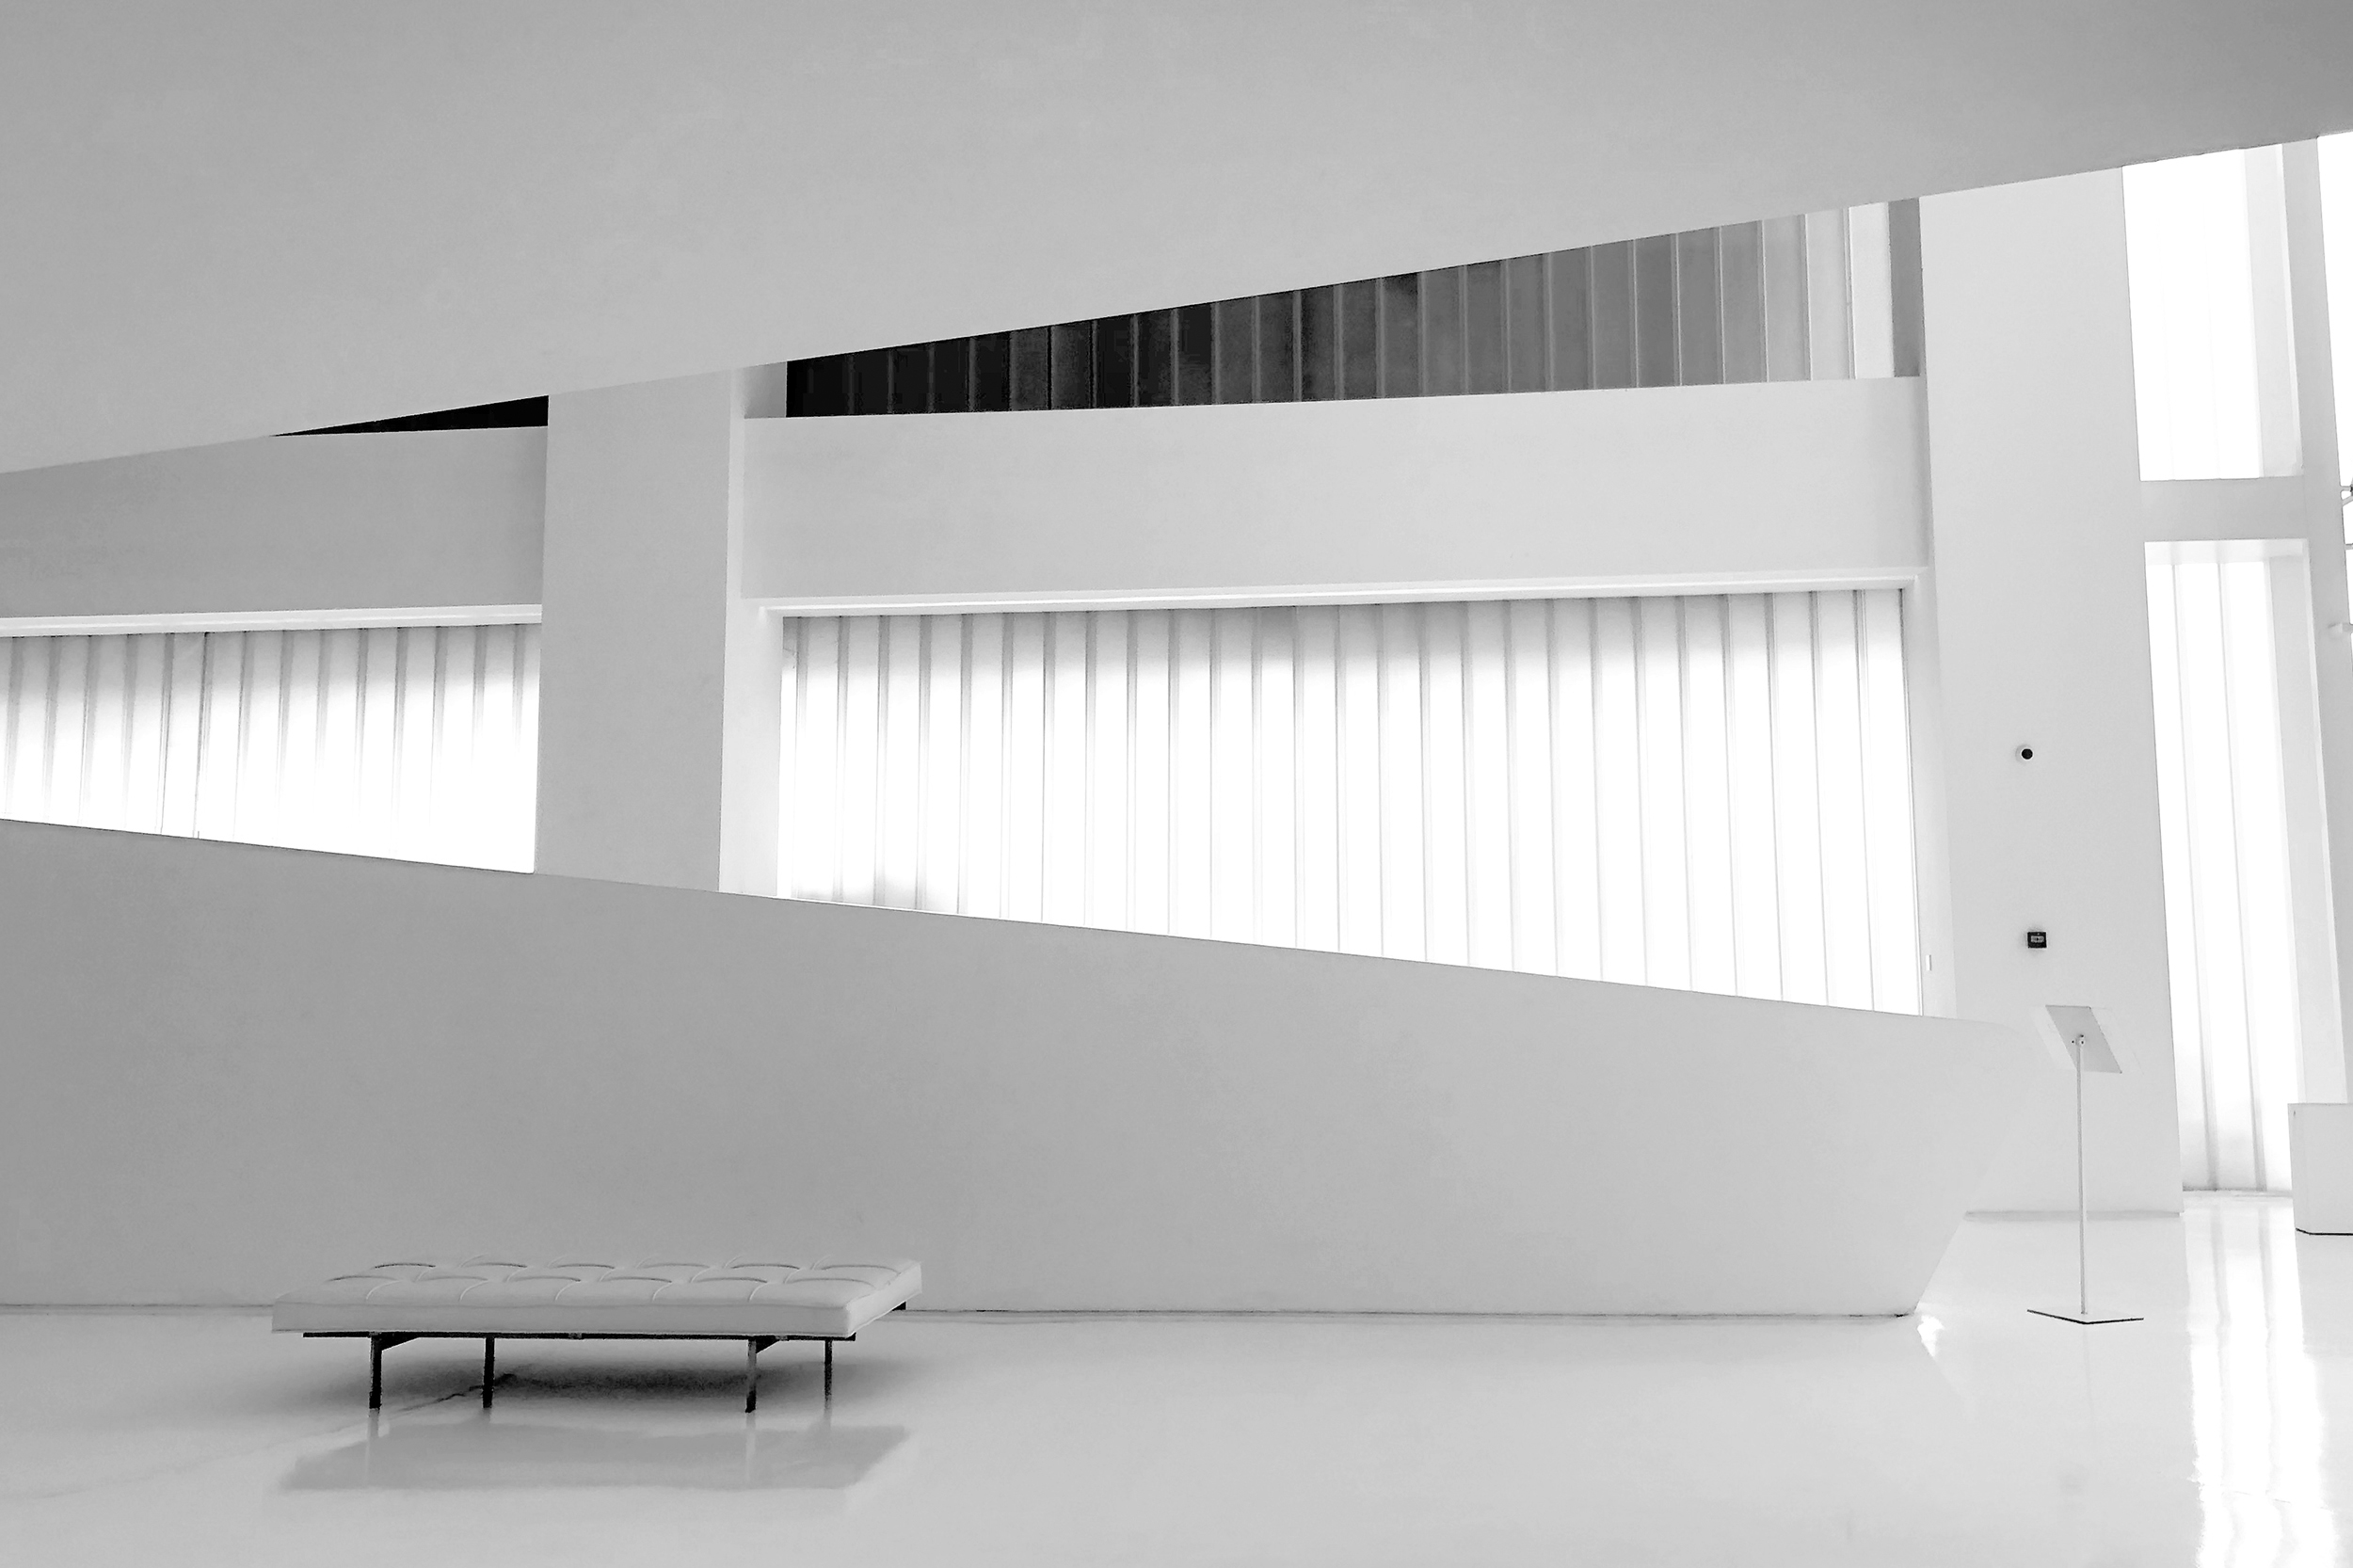 JuicyDesign-Projecthero-2500x1666-InteriorBranding-Blackswan-05 copy.jpg